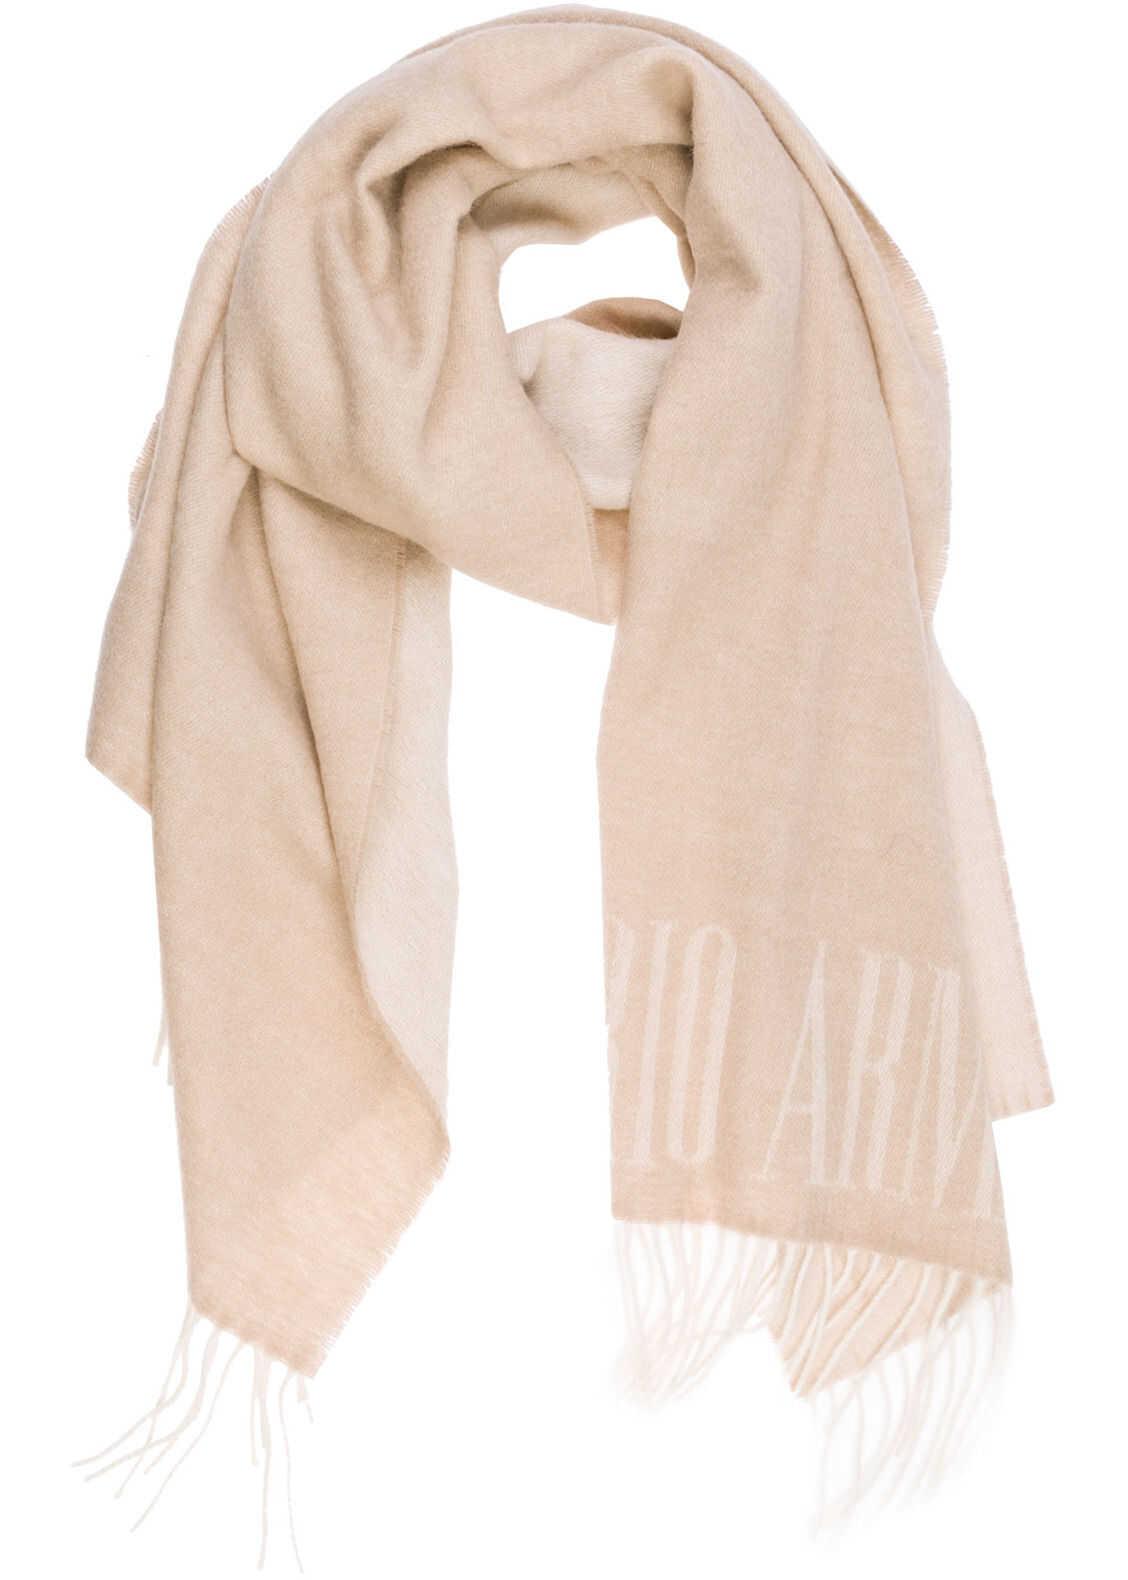 Emporio Armani Wool Scarf Beige